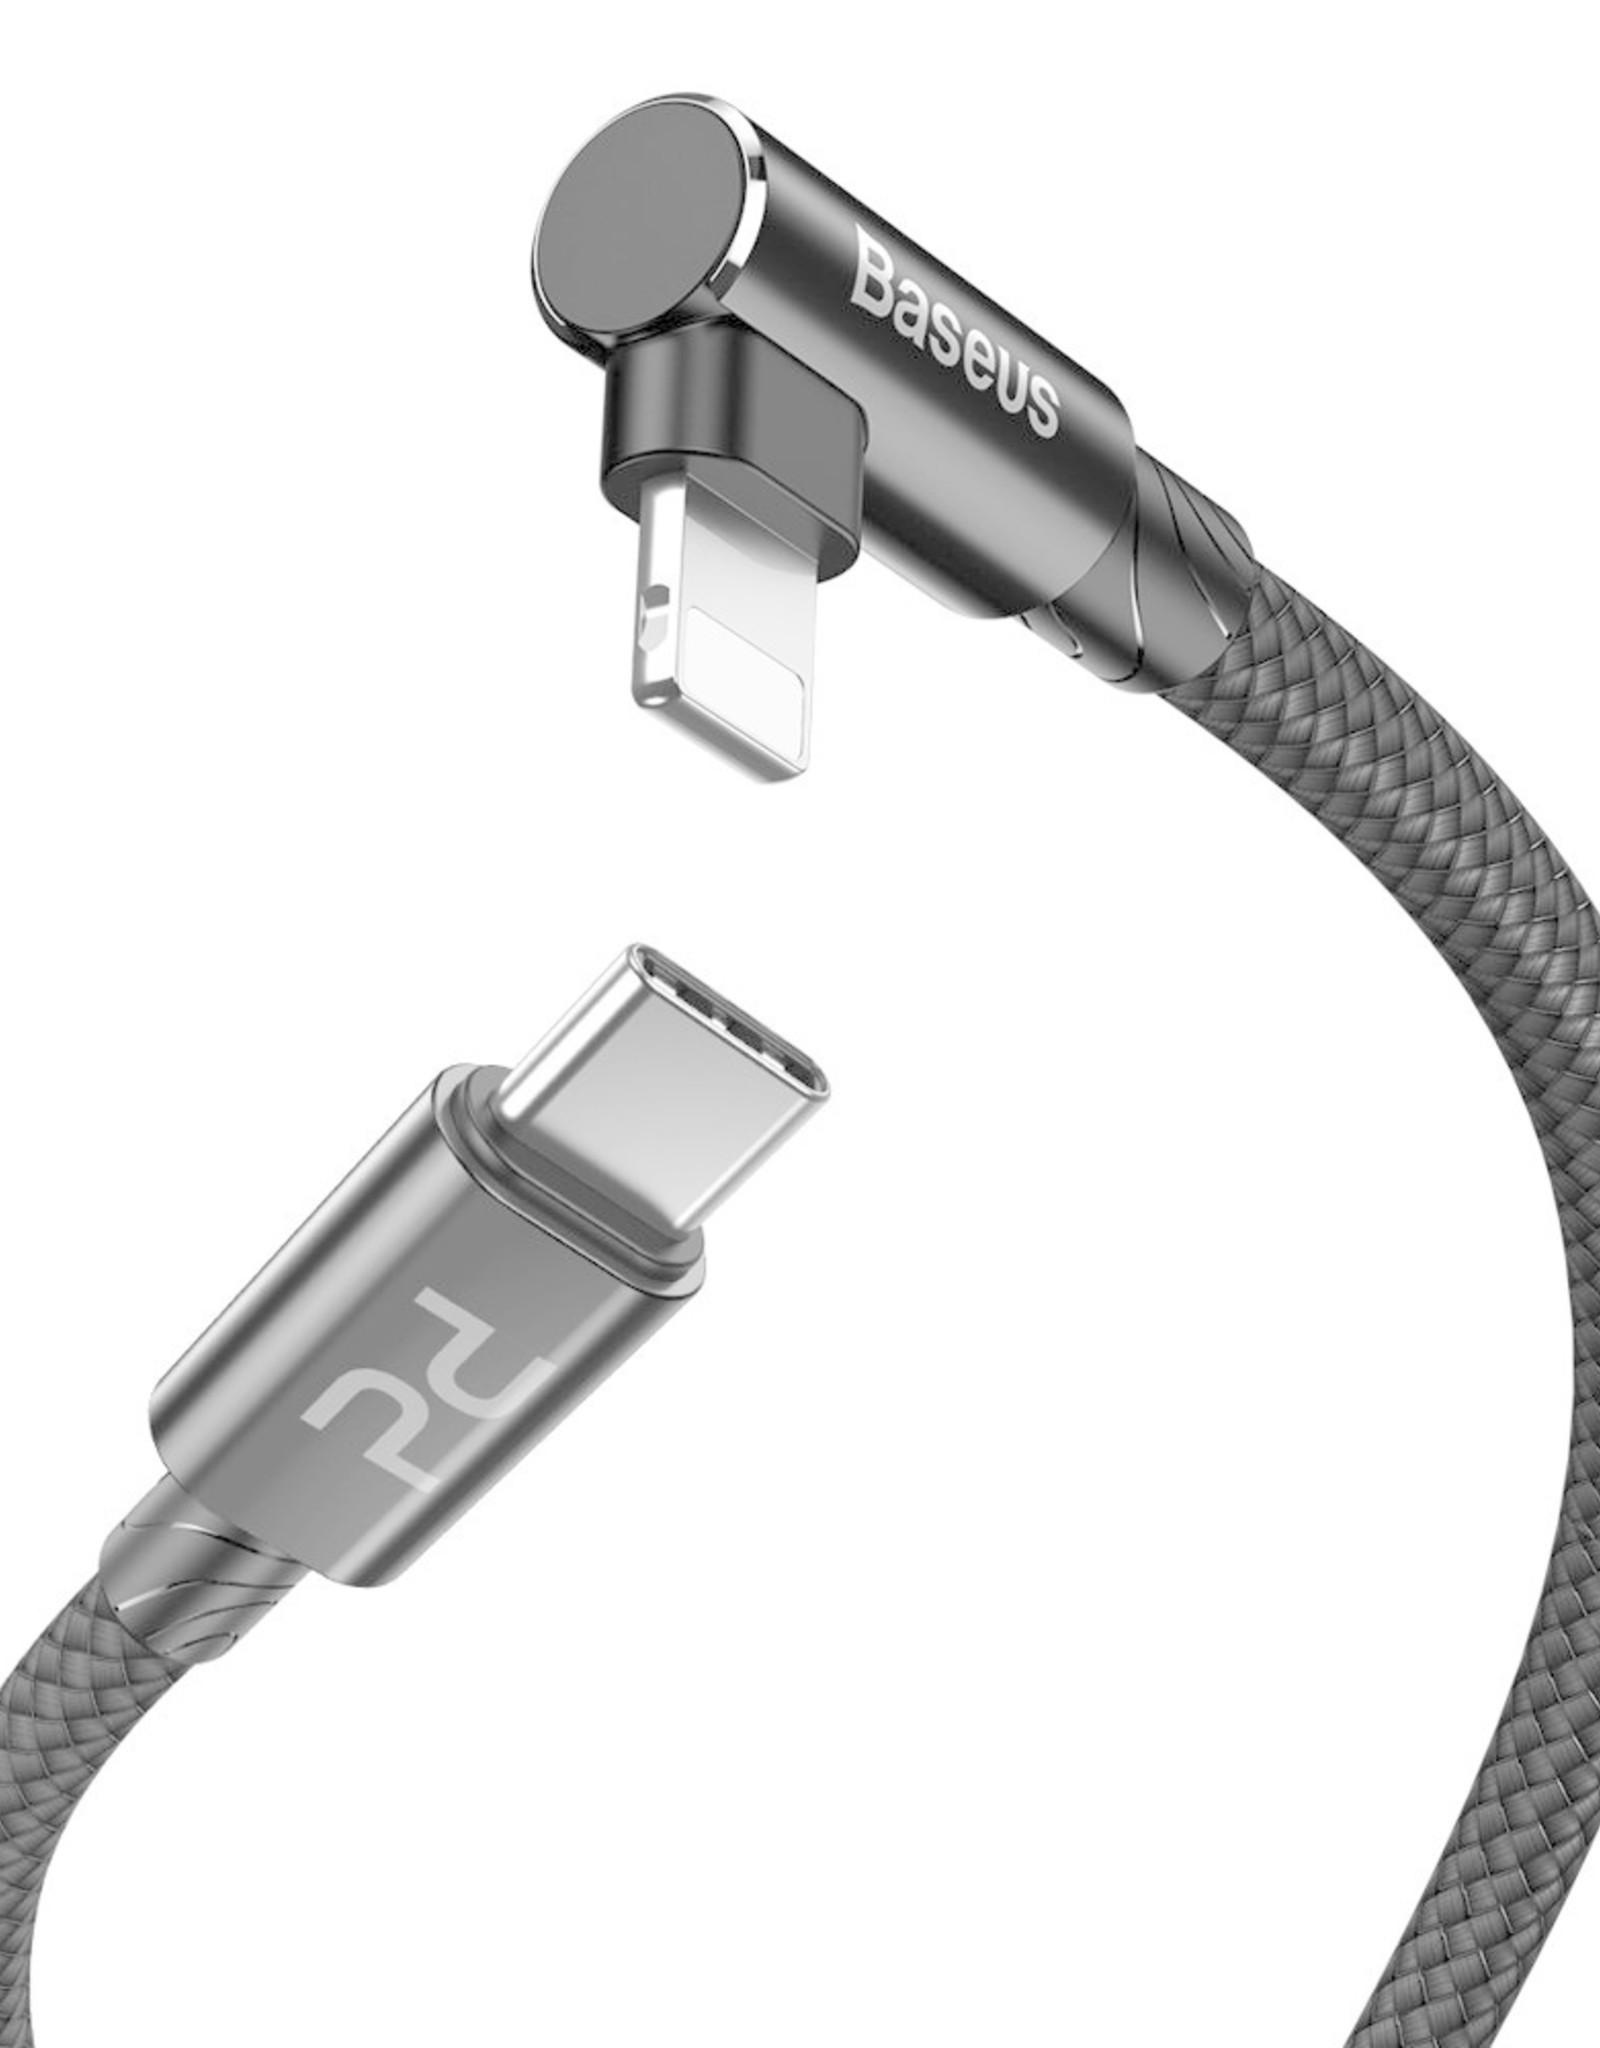 Baseus Baseus MVP Elbow Type-C to Lightning Cable PD 18W 2m Black